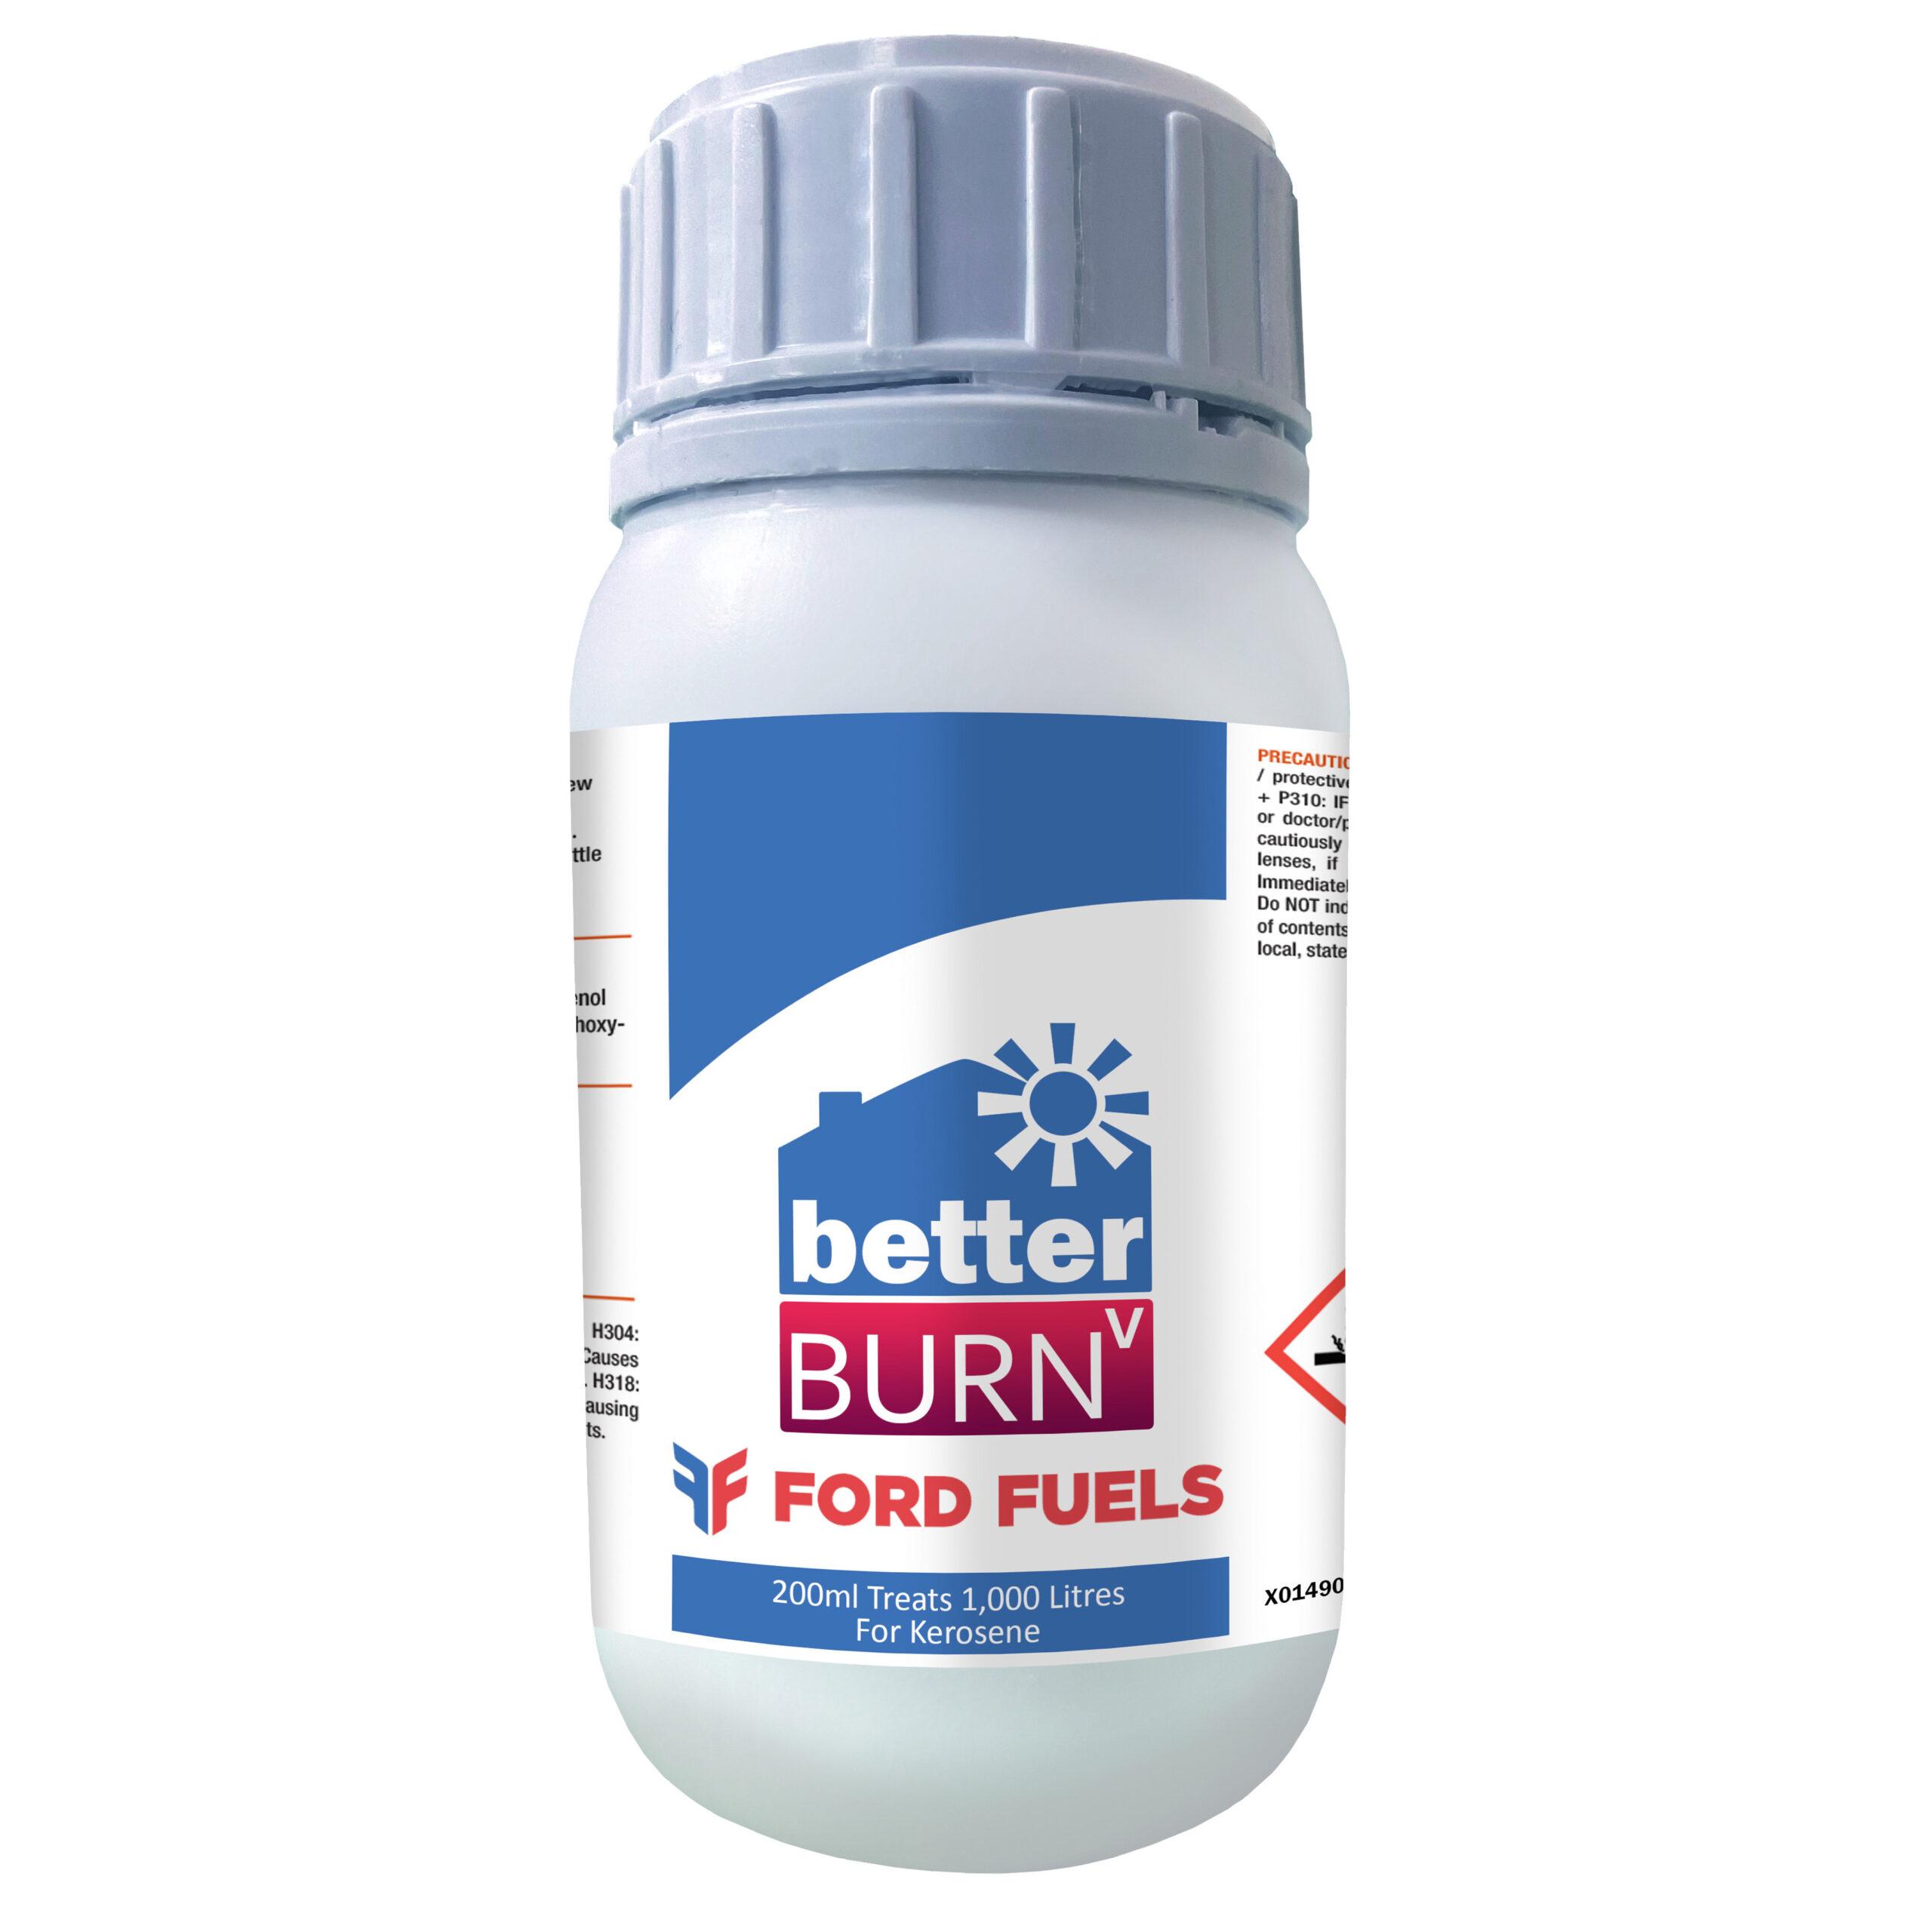 https://commercial.fordfuels.co.uk/wp-content/uploads/sites/10/betterBURN-V-scaled-350x350.jpg+https://commercial.fordfuels.co.uk/wp-content/uploads/sites/10/betterBURN-V-scaled-700x700.jpg